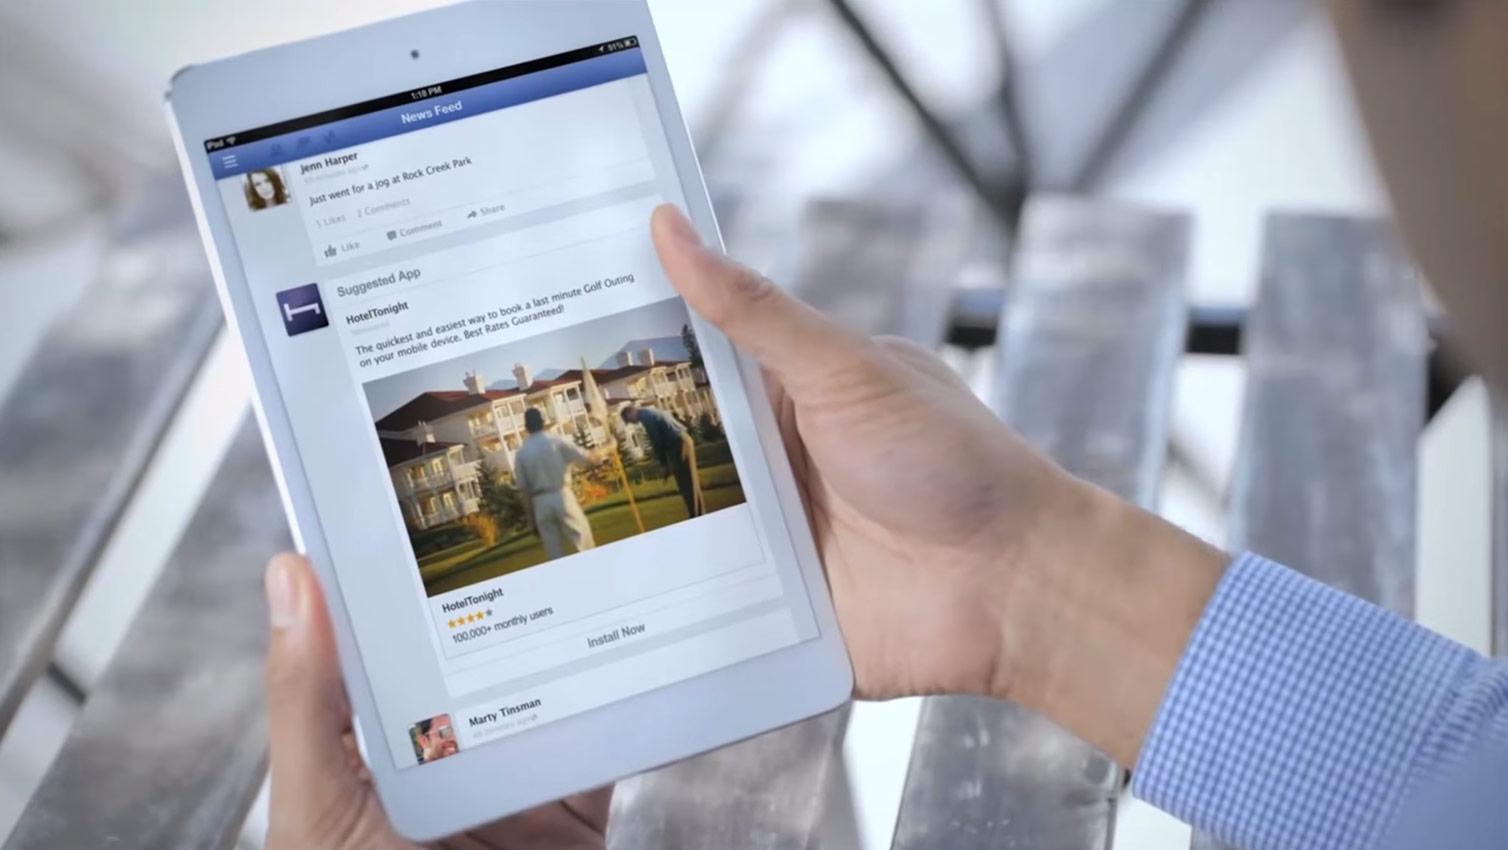 8 Best Practices for Facebook Mobile App Ads